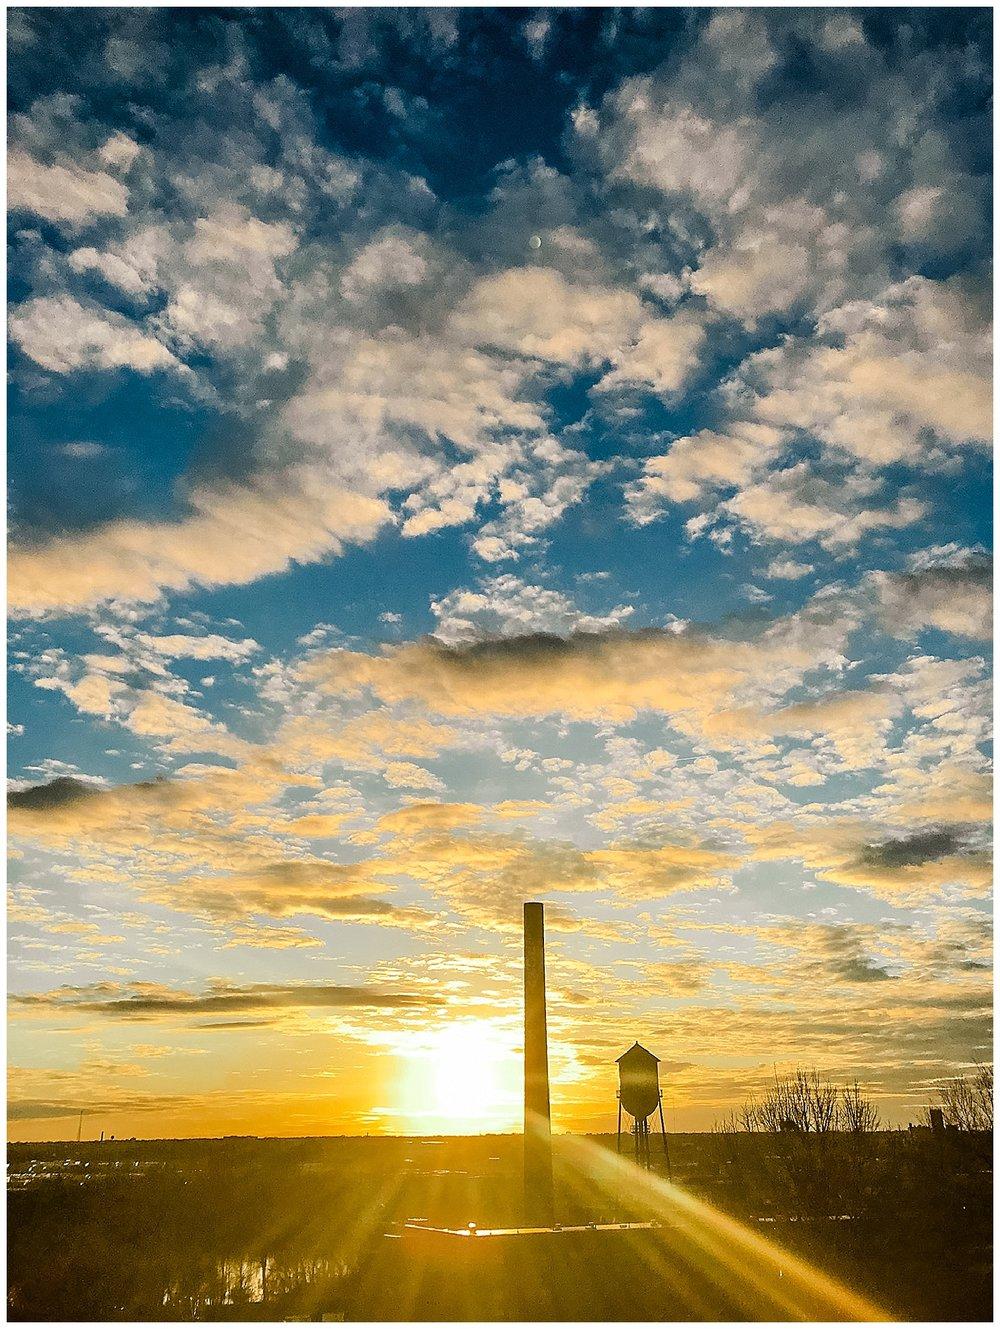 Sunset at Libby Park - Church Hill - Richmond, VA